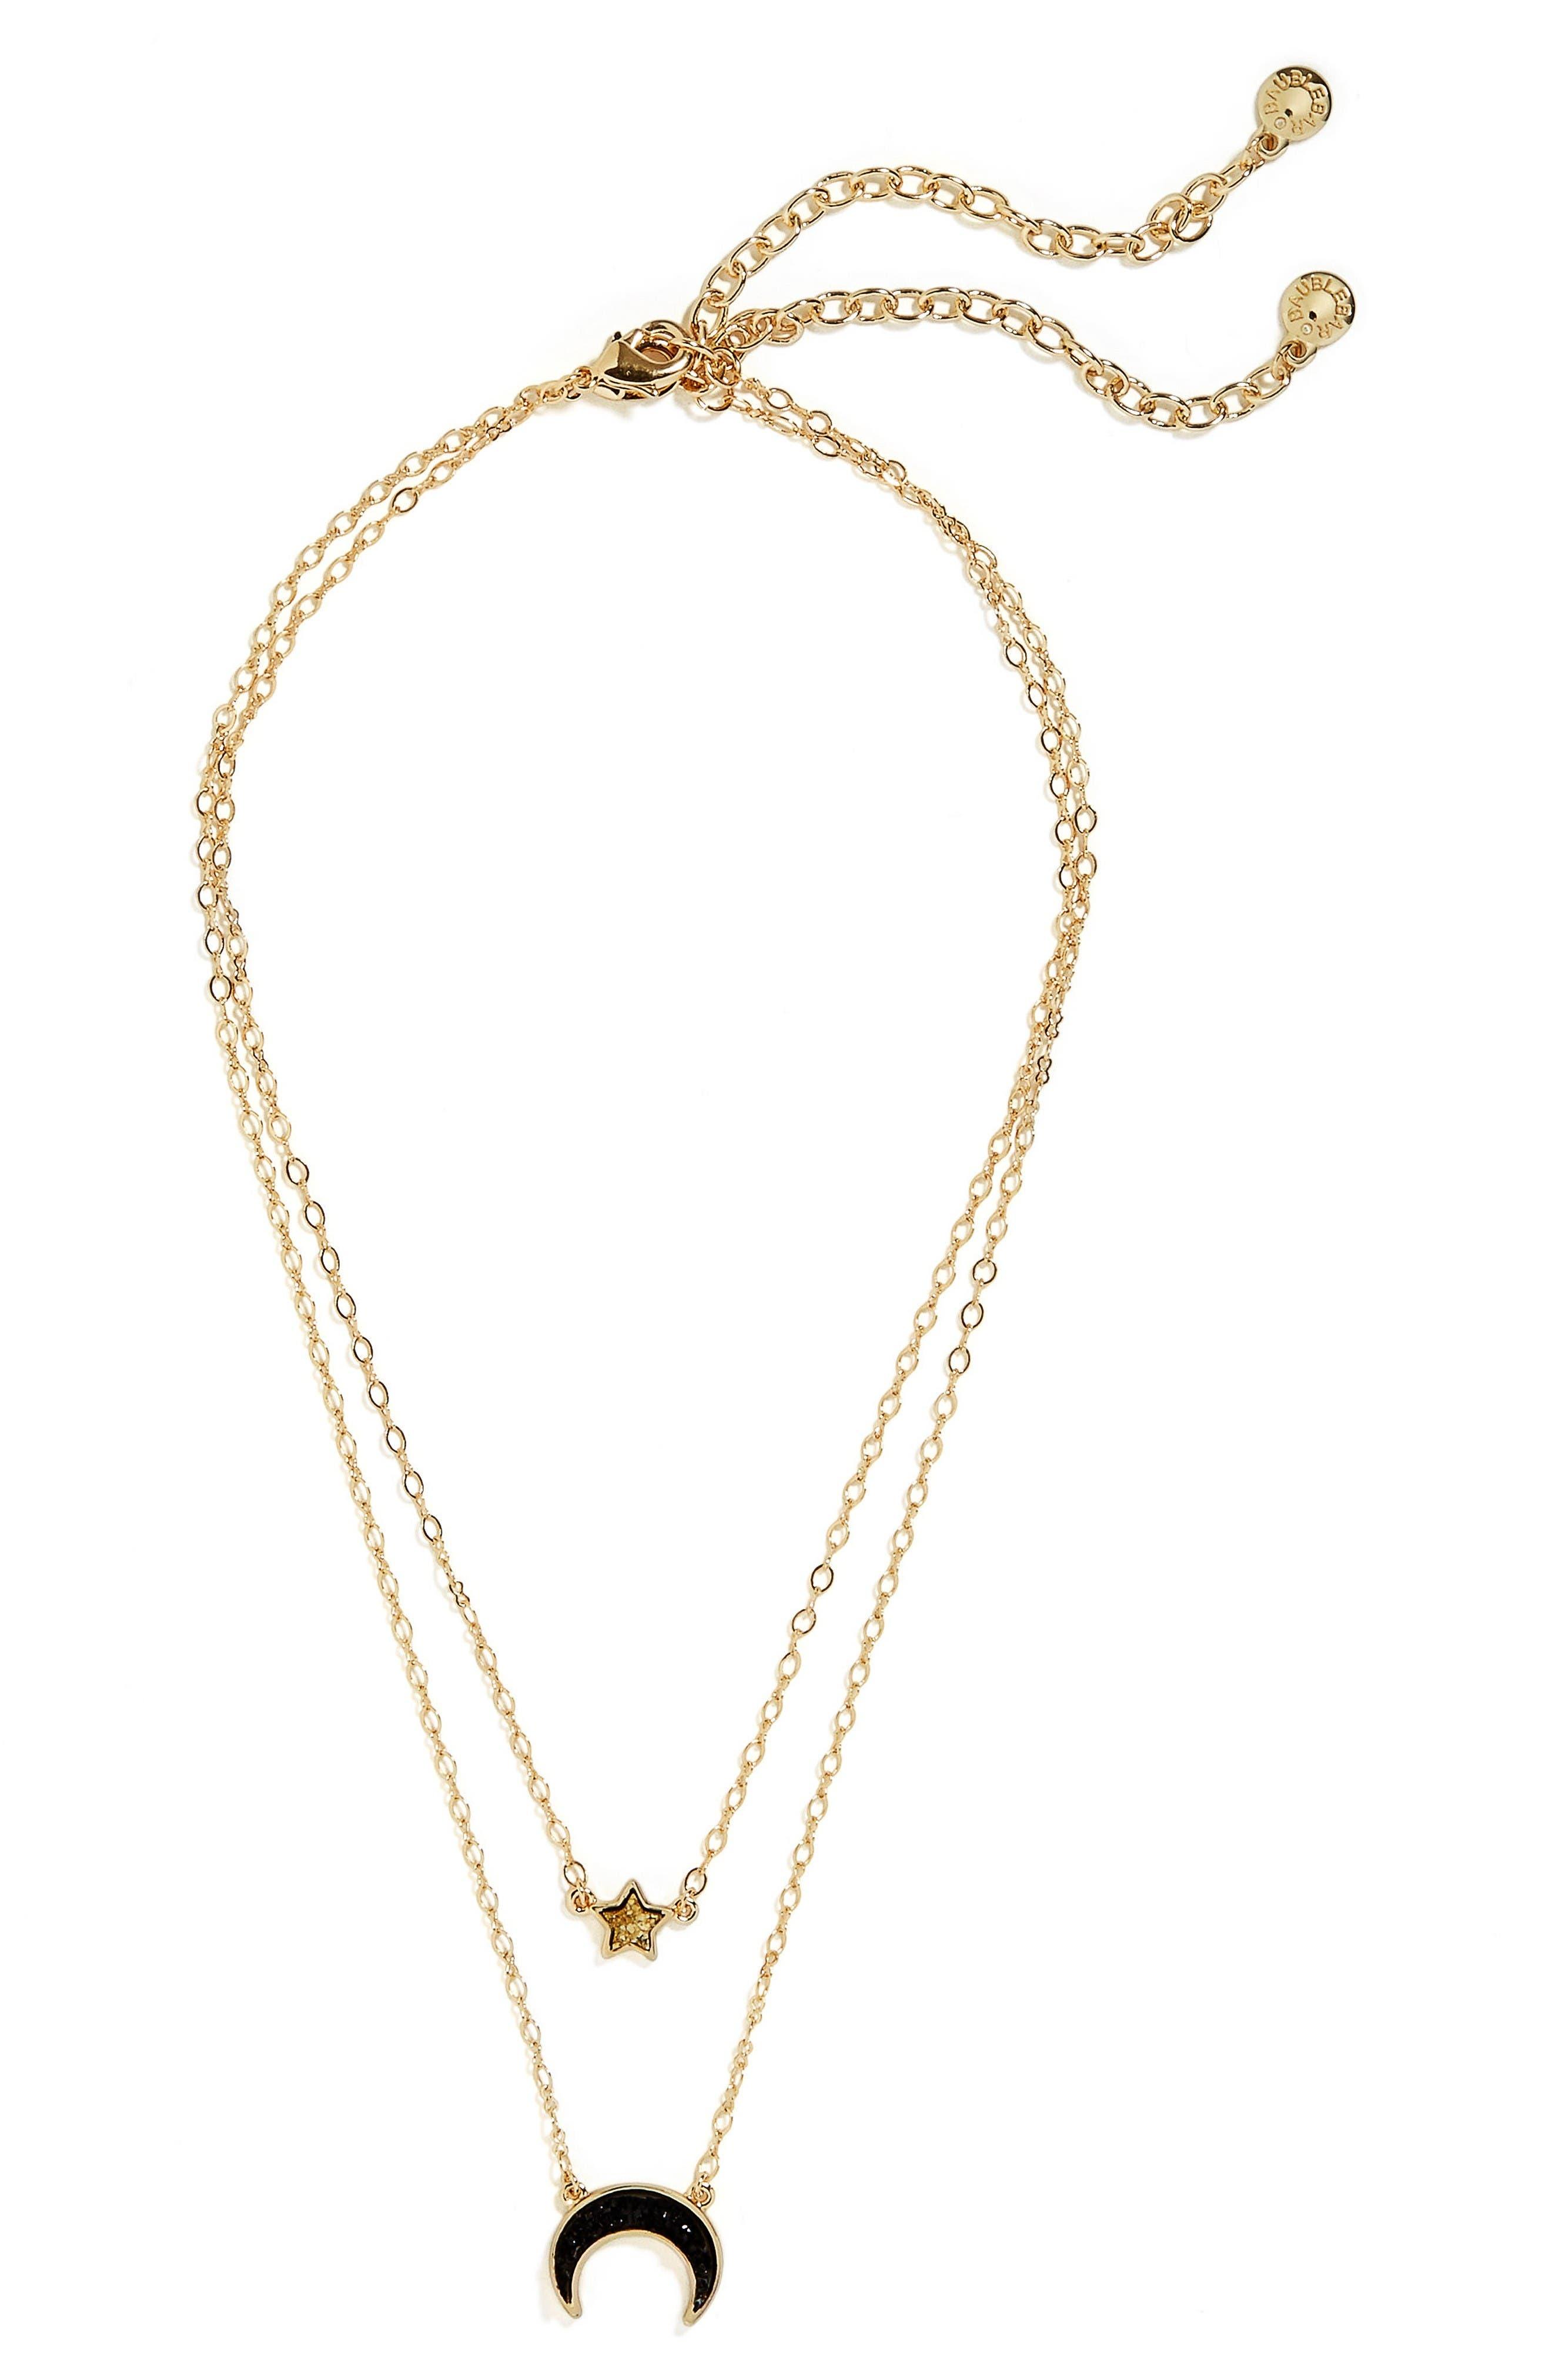 Alternate Image 1 Selected - BaubleBar Skye Layered Necklace